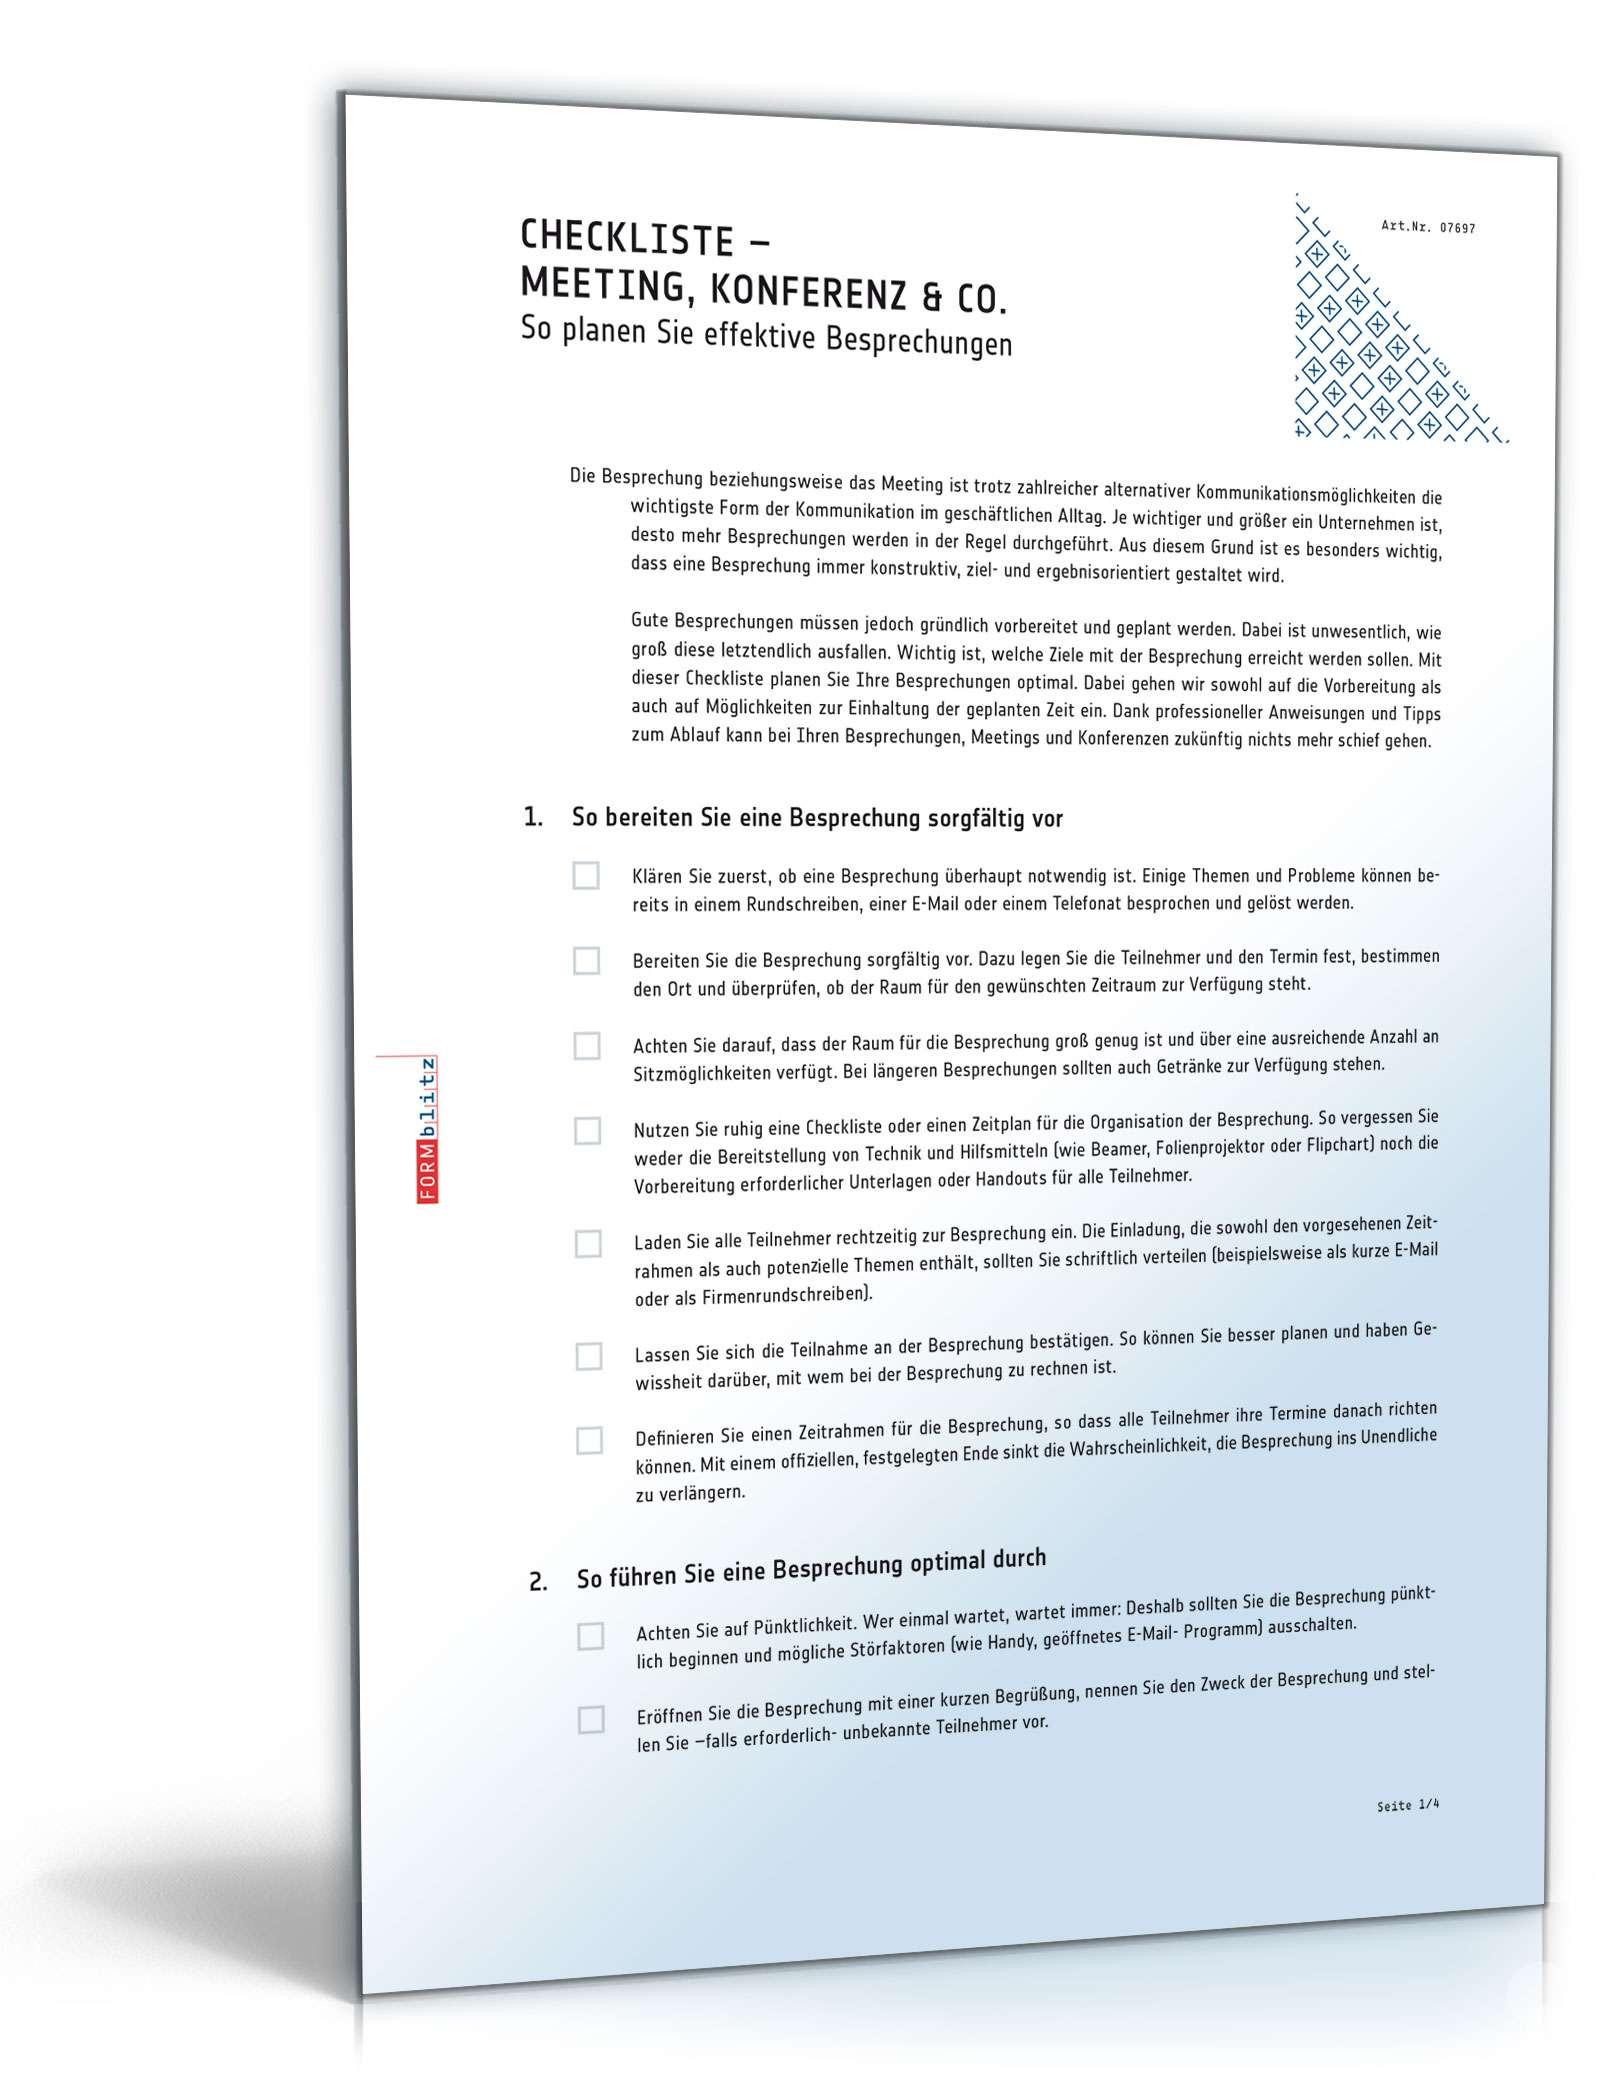 Meeting / Besprechung planen - Checkliste zum Download